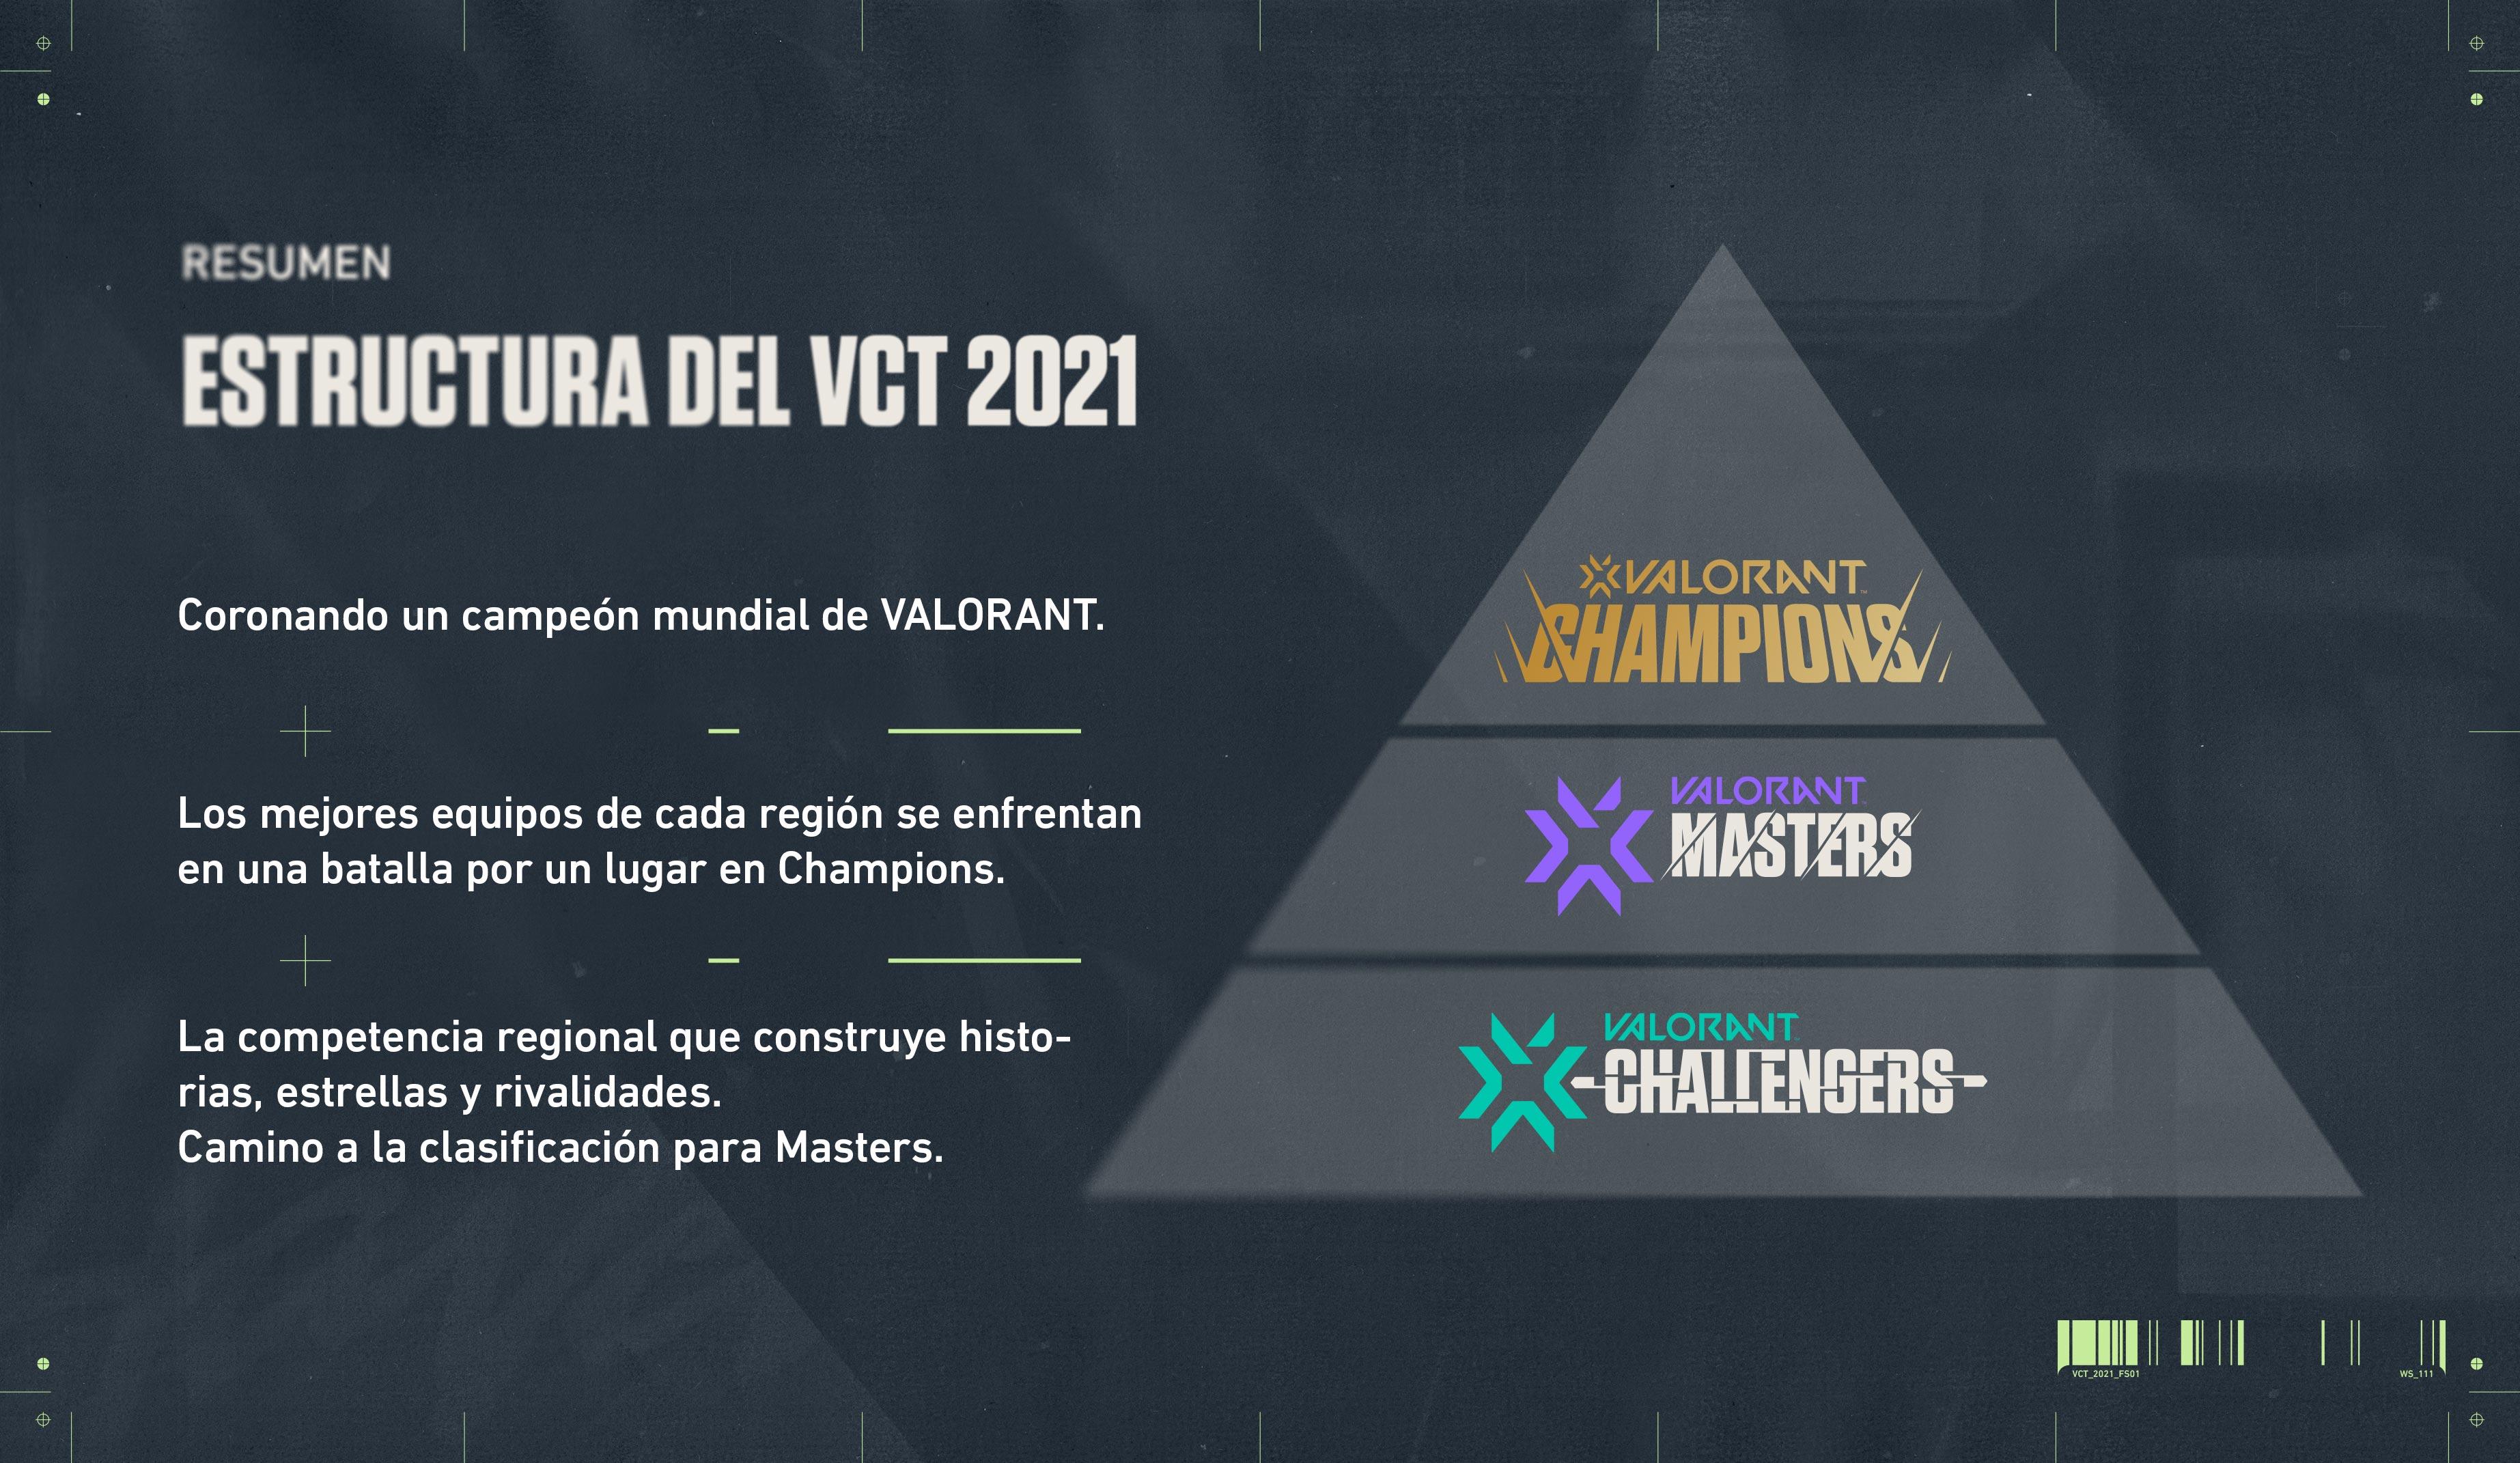 Estructura del Torneo de Valorant 2021